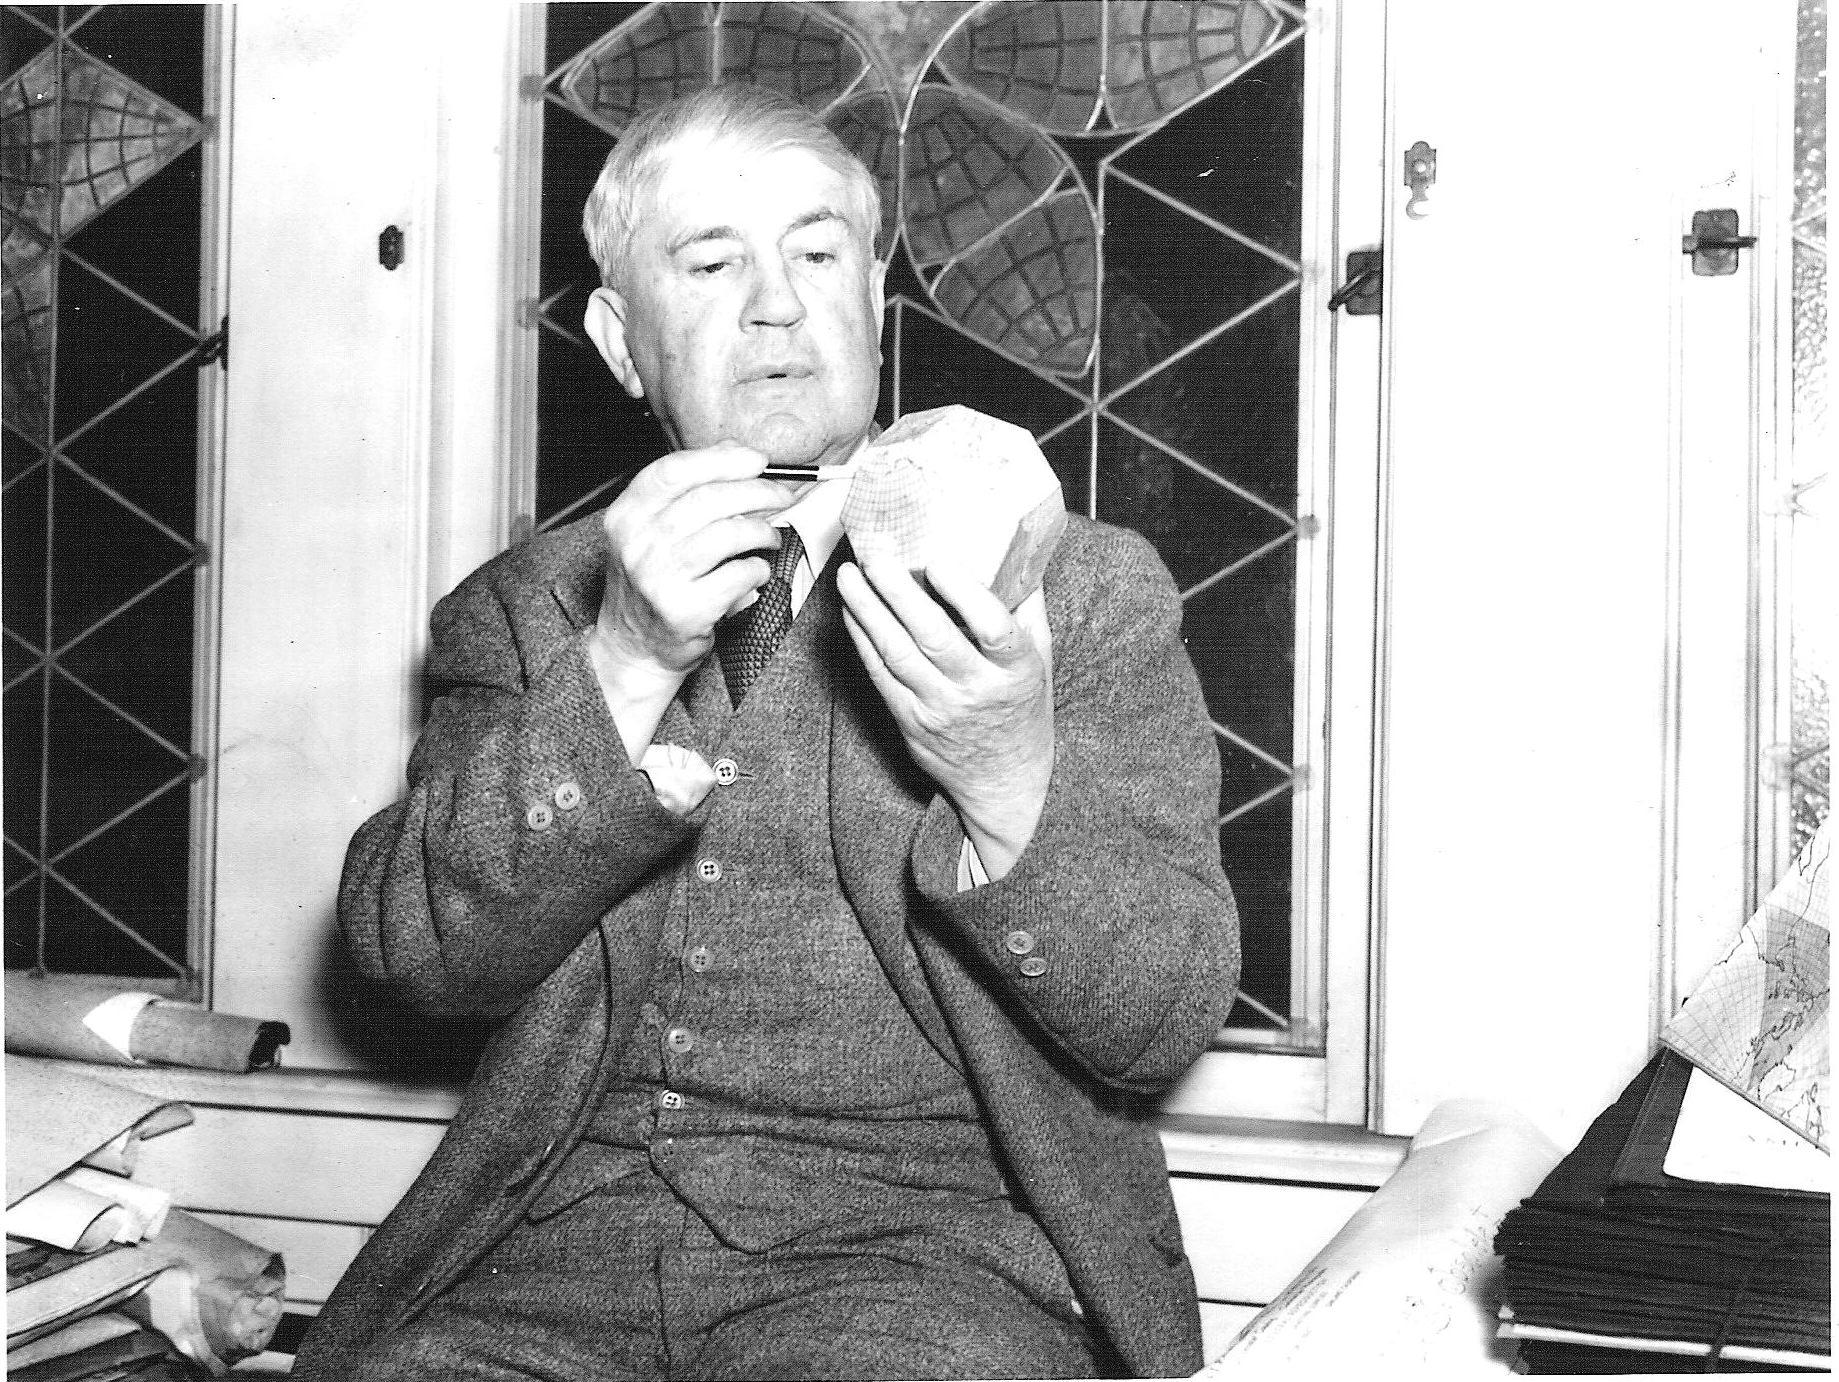 B.J..S. Cahill